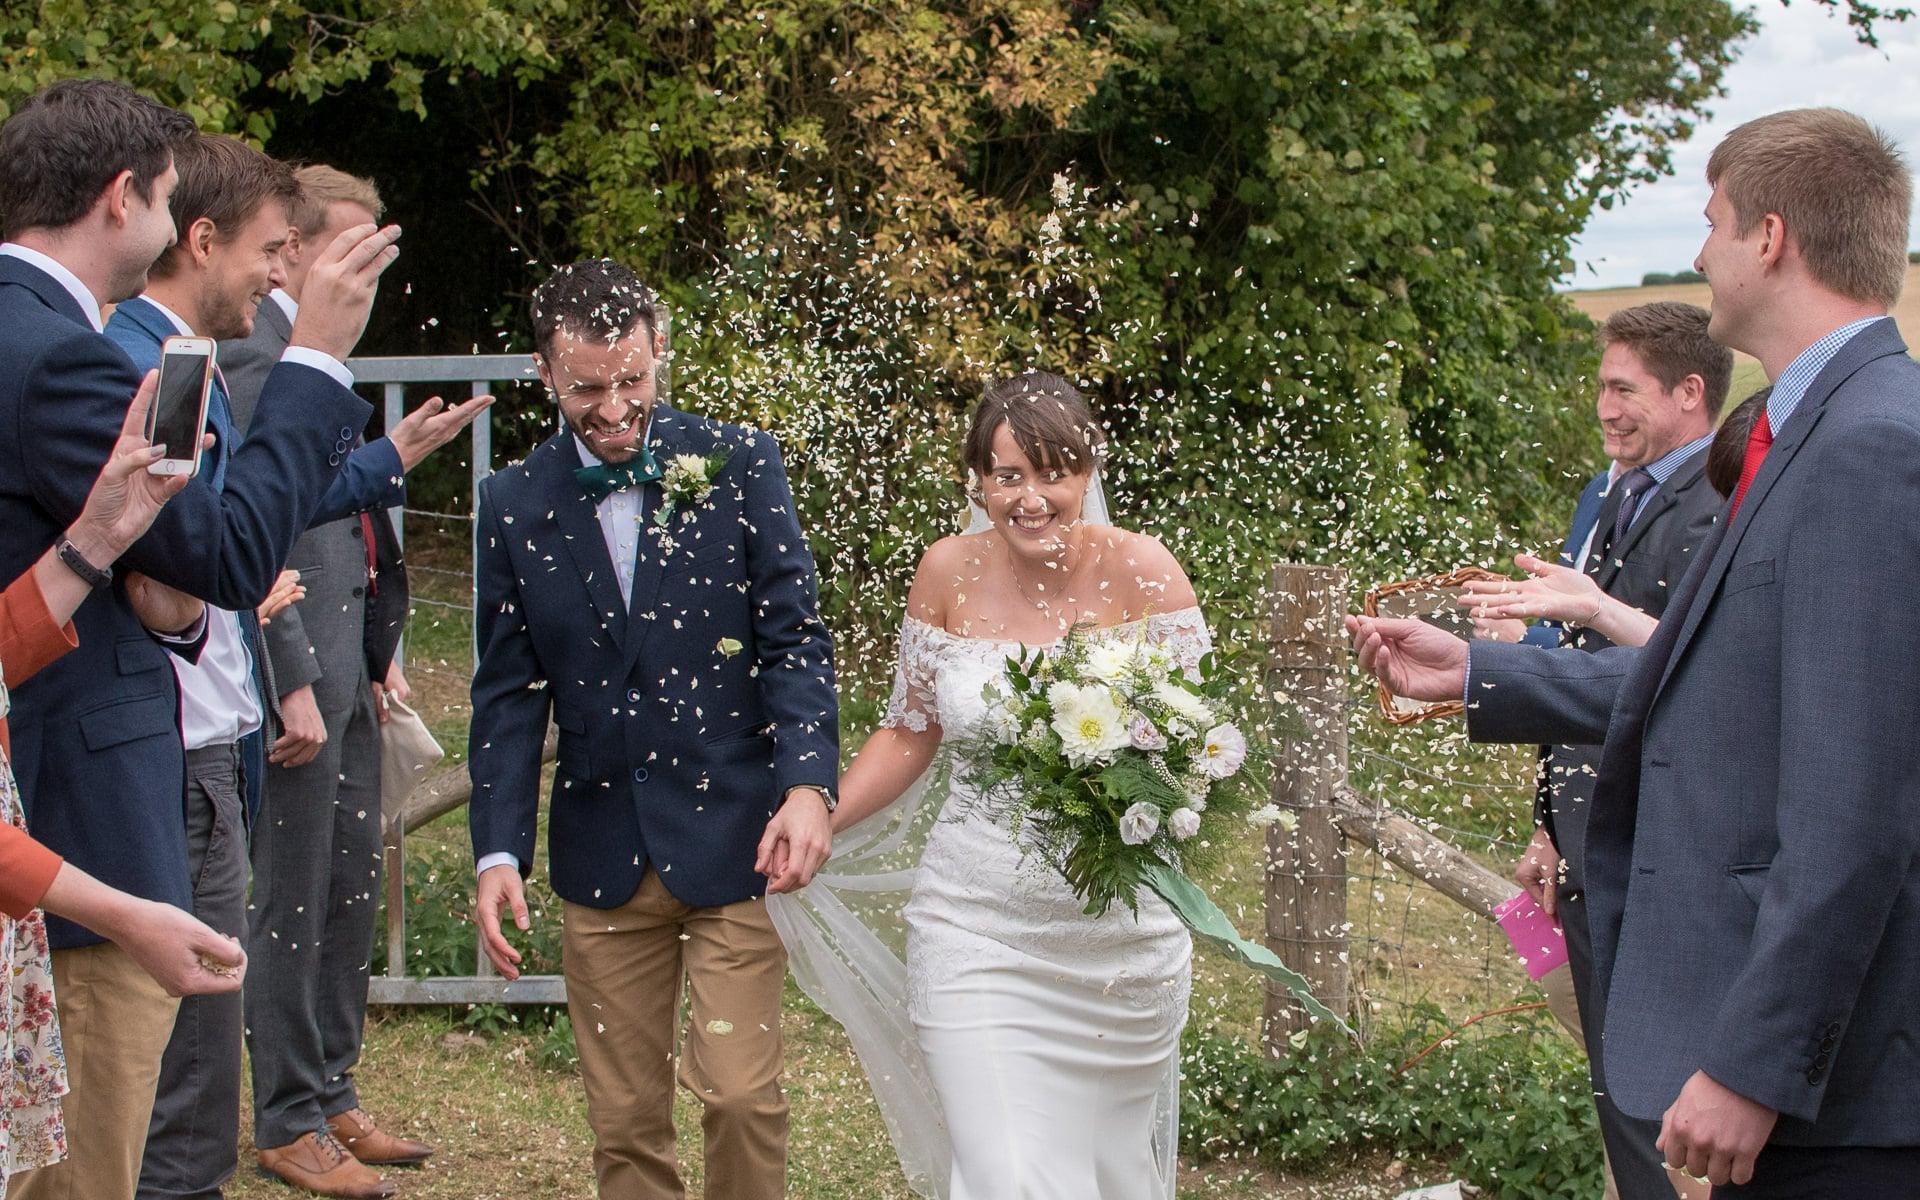 Wedding confetti photo of couple at an outdoor wedding